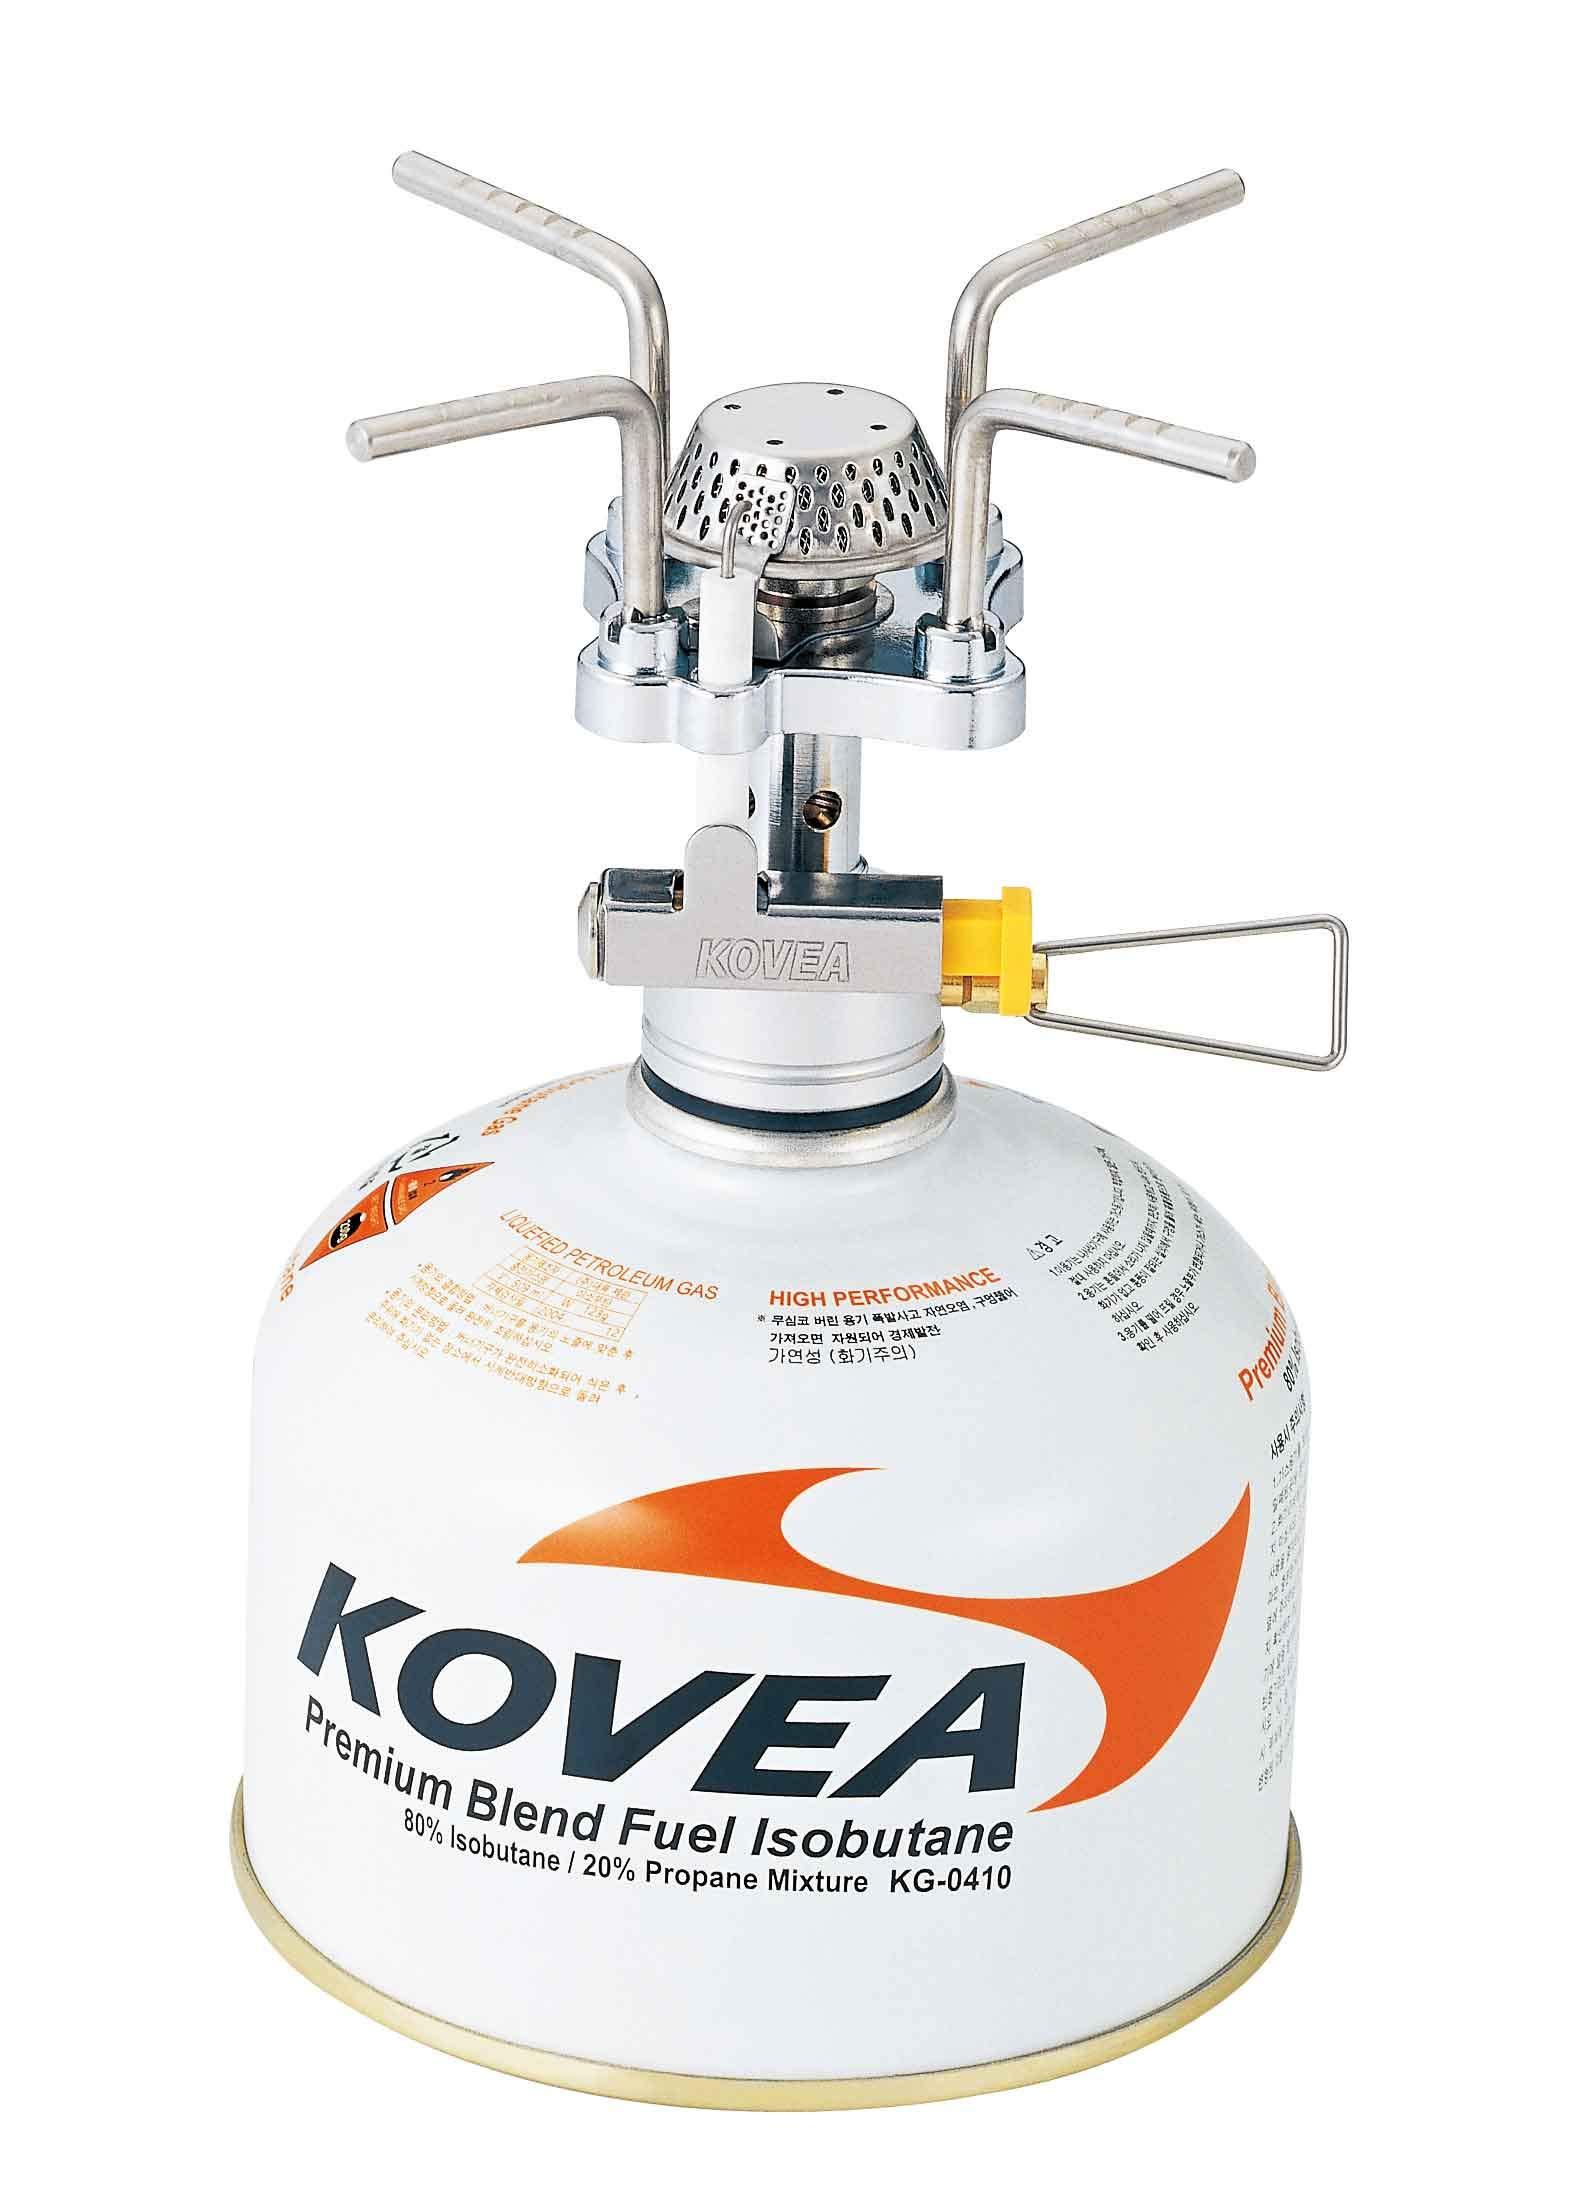 X-1 STOVE KOVEA KB-0409: Buy Online at Best Price in UAE - Amazon.ae